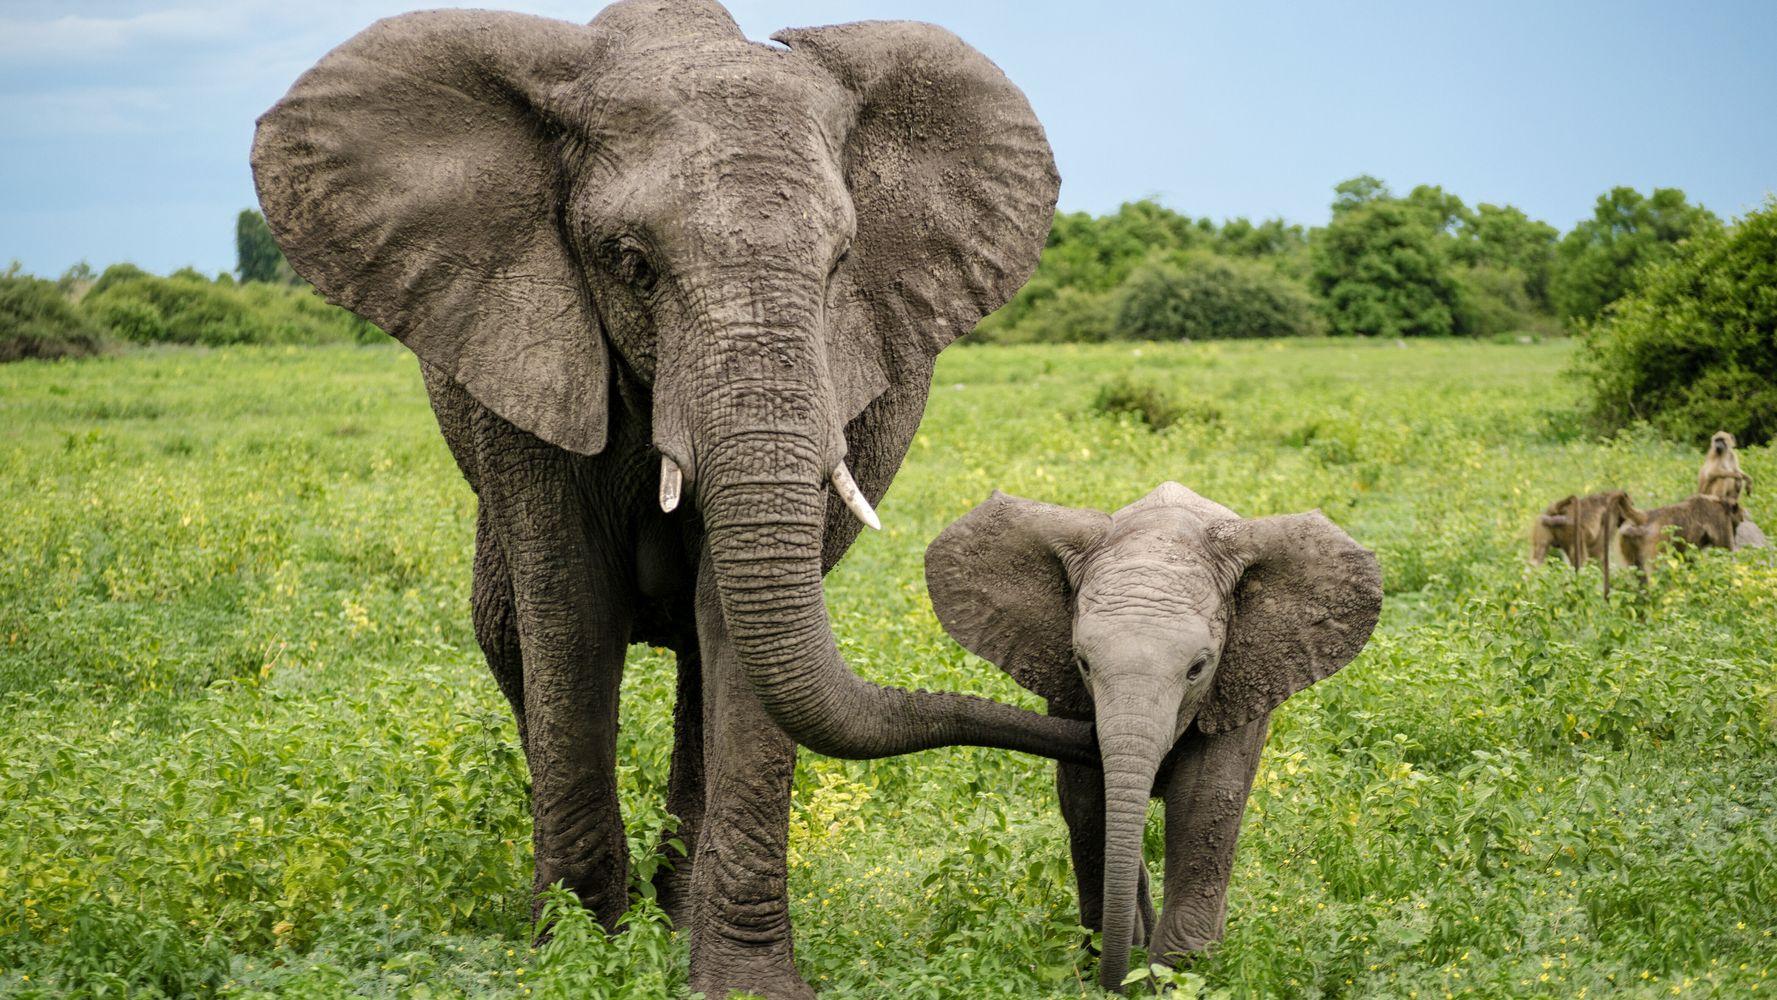 Botswana Selling Licenses To Kill Elephants At $39,000 A Head